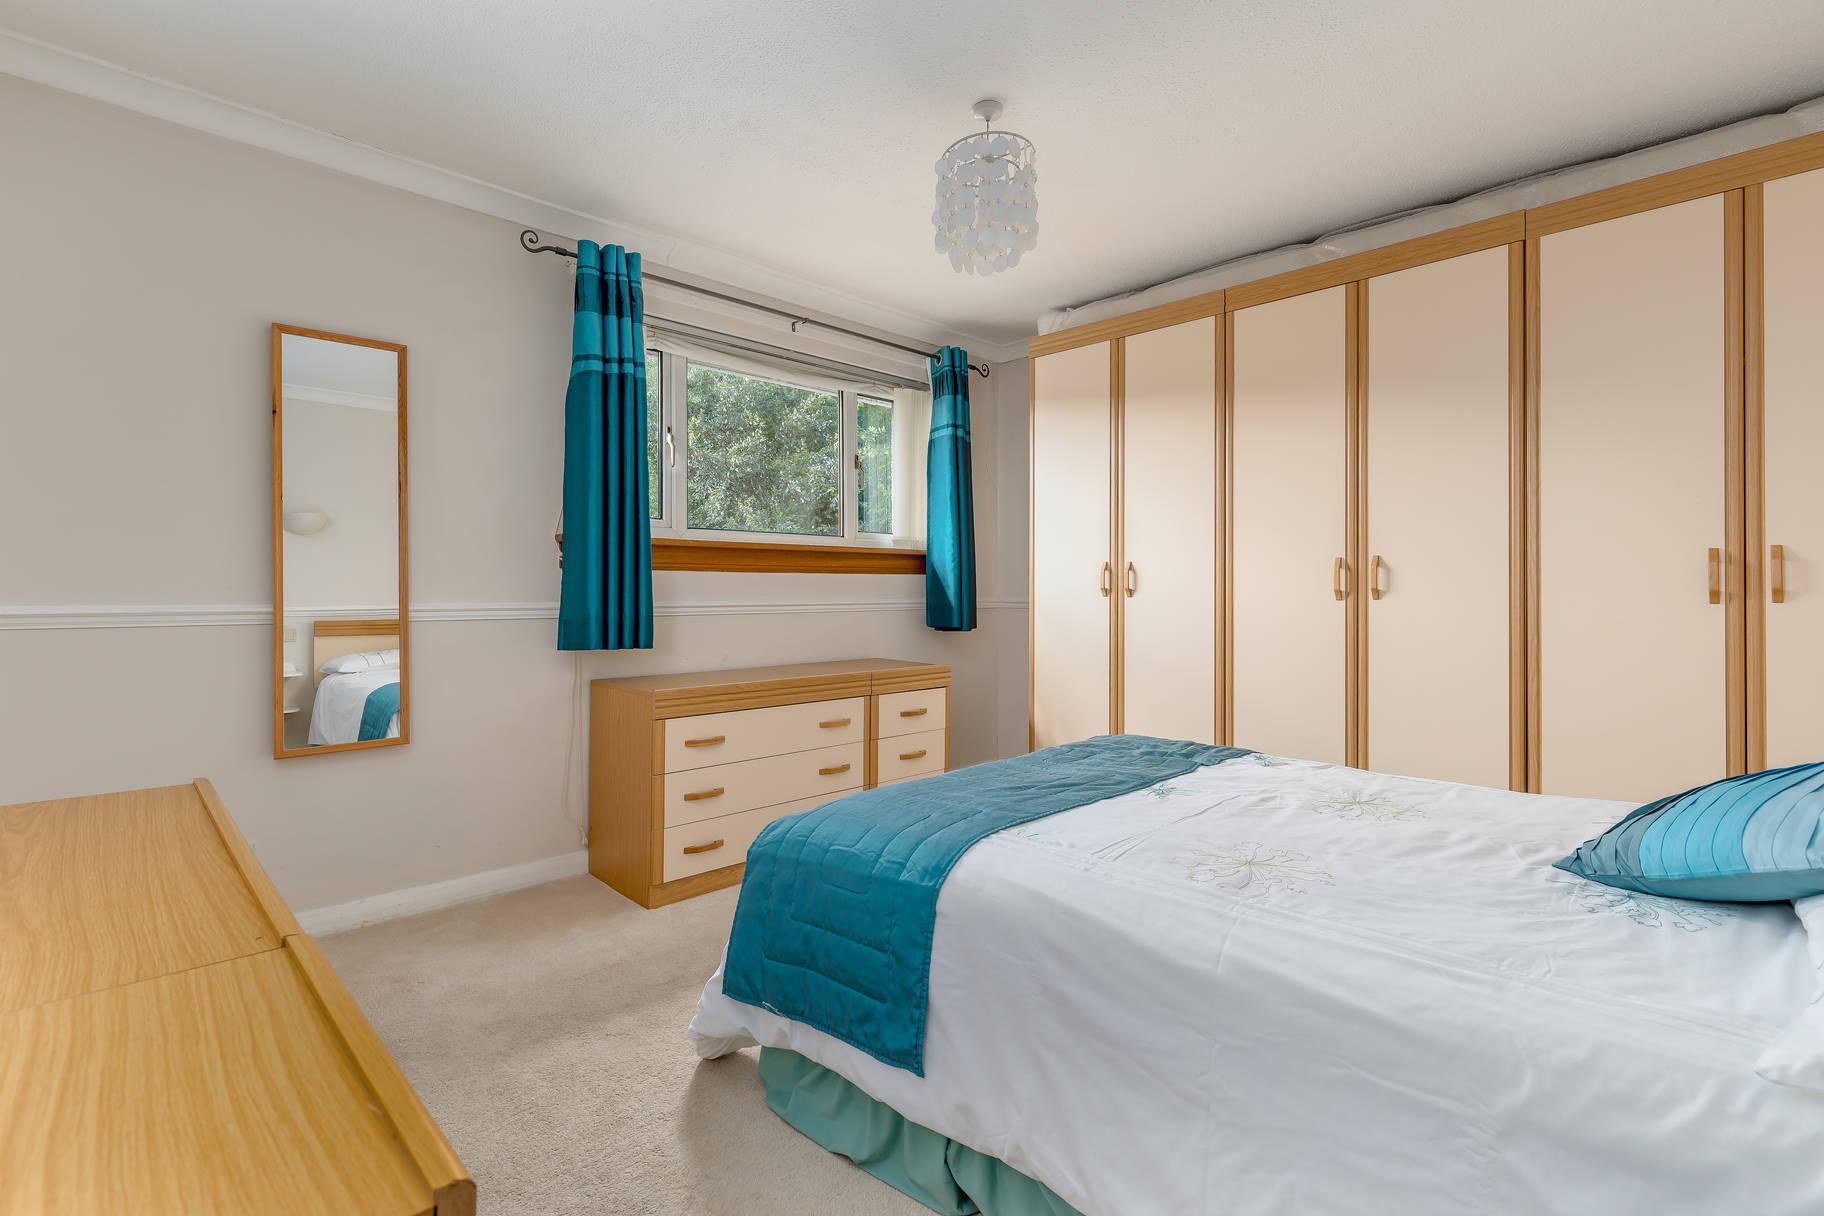 34 Baberton Mains Lea, Edinburgh, EH14 3HB